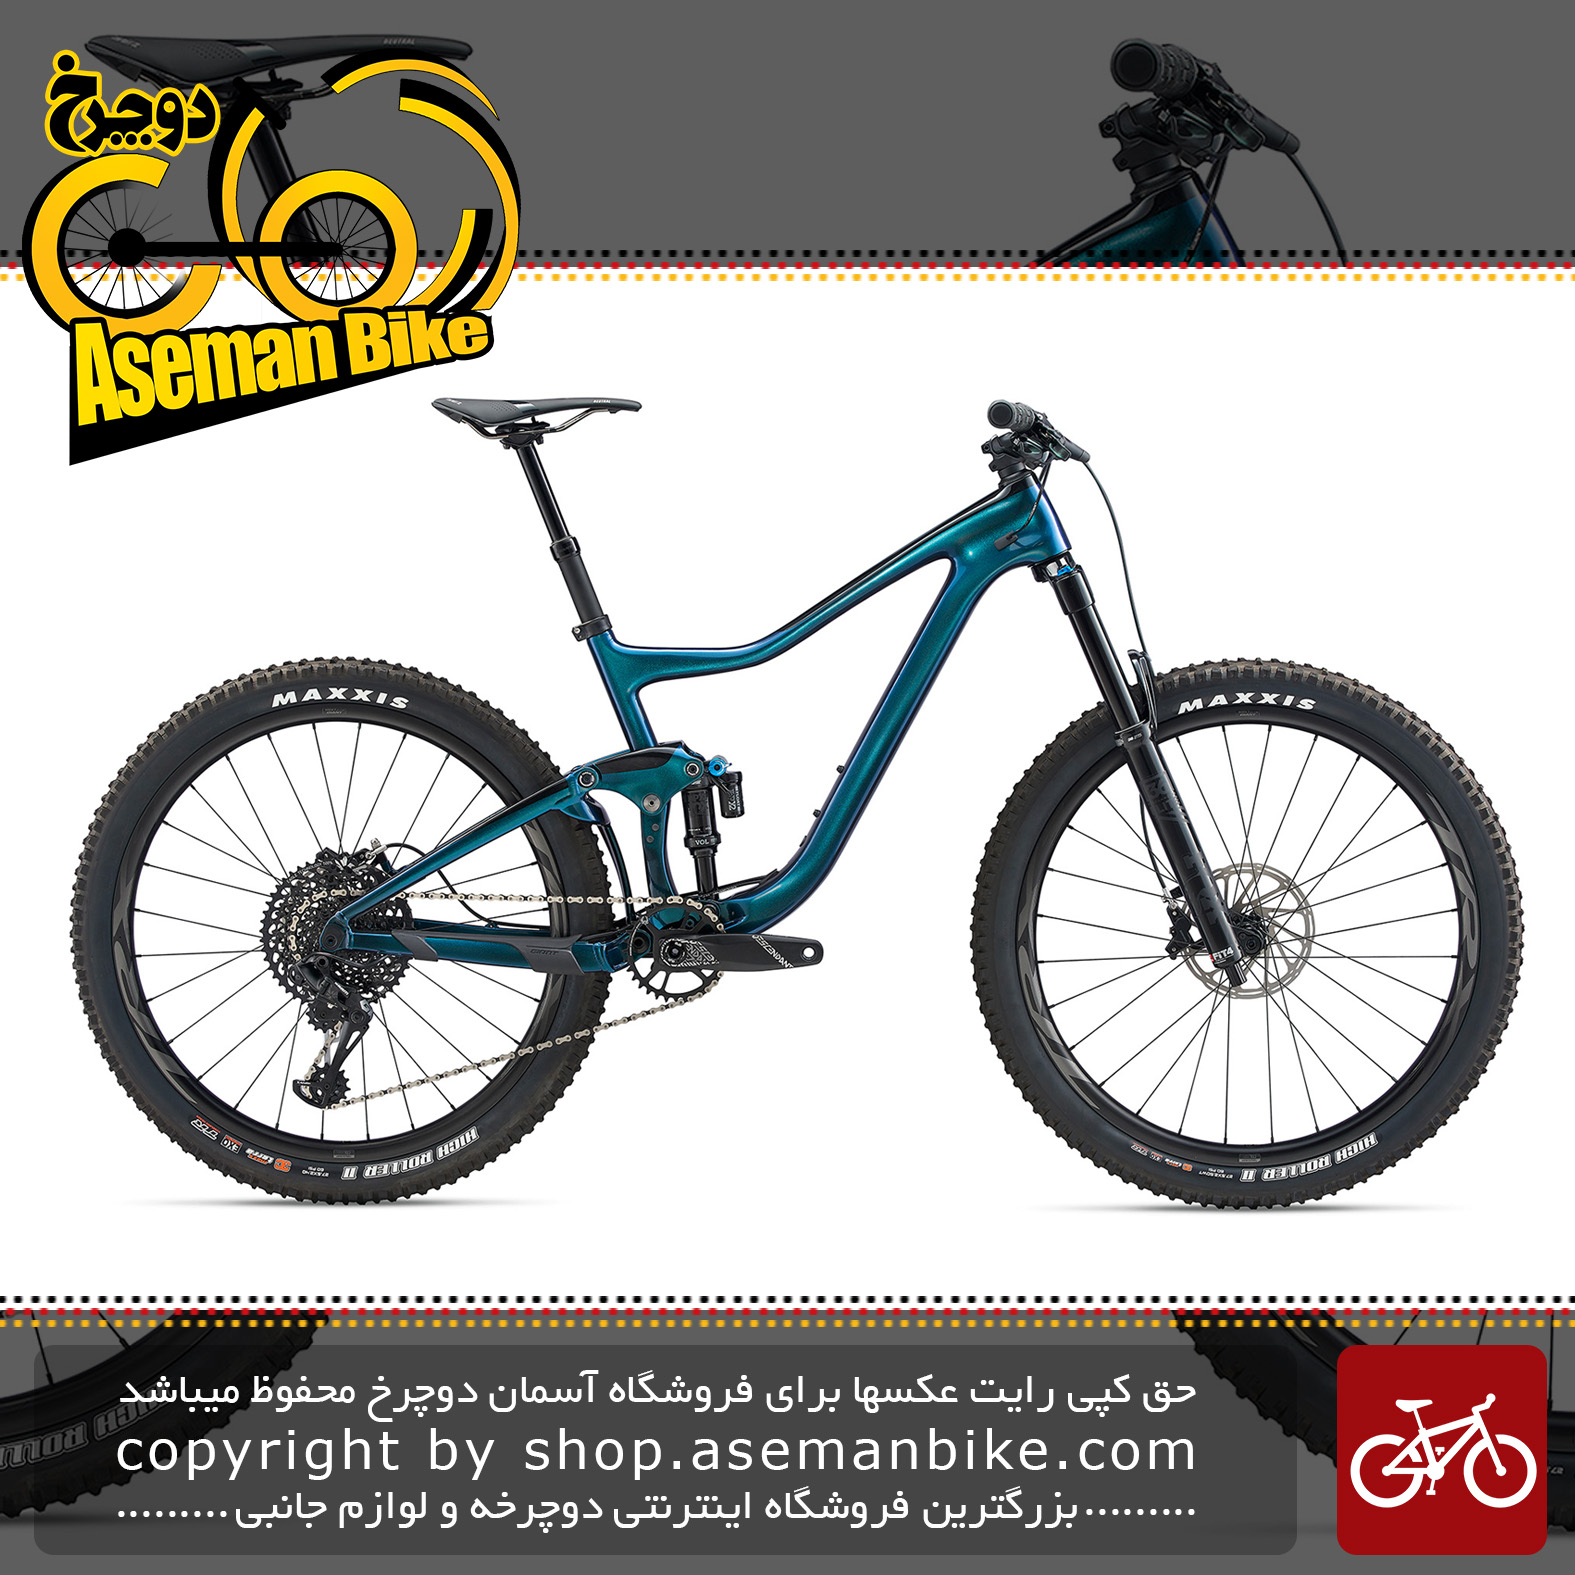 دوچرخه کوهستان جاینت مدل ترنس ادونس 1 2020 Giant Mountain Bicycle Trance Advanced 1 2020